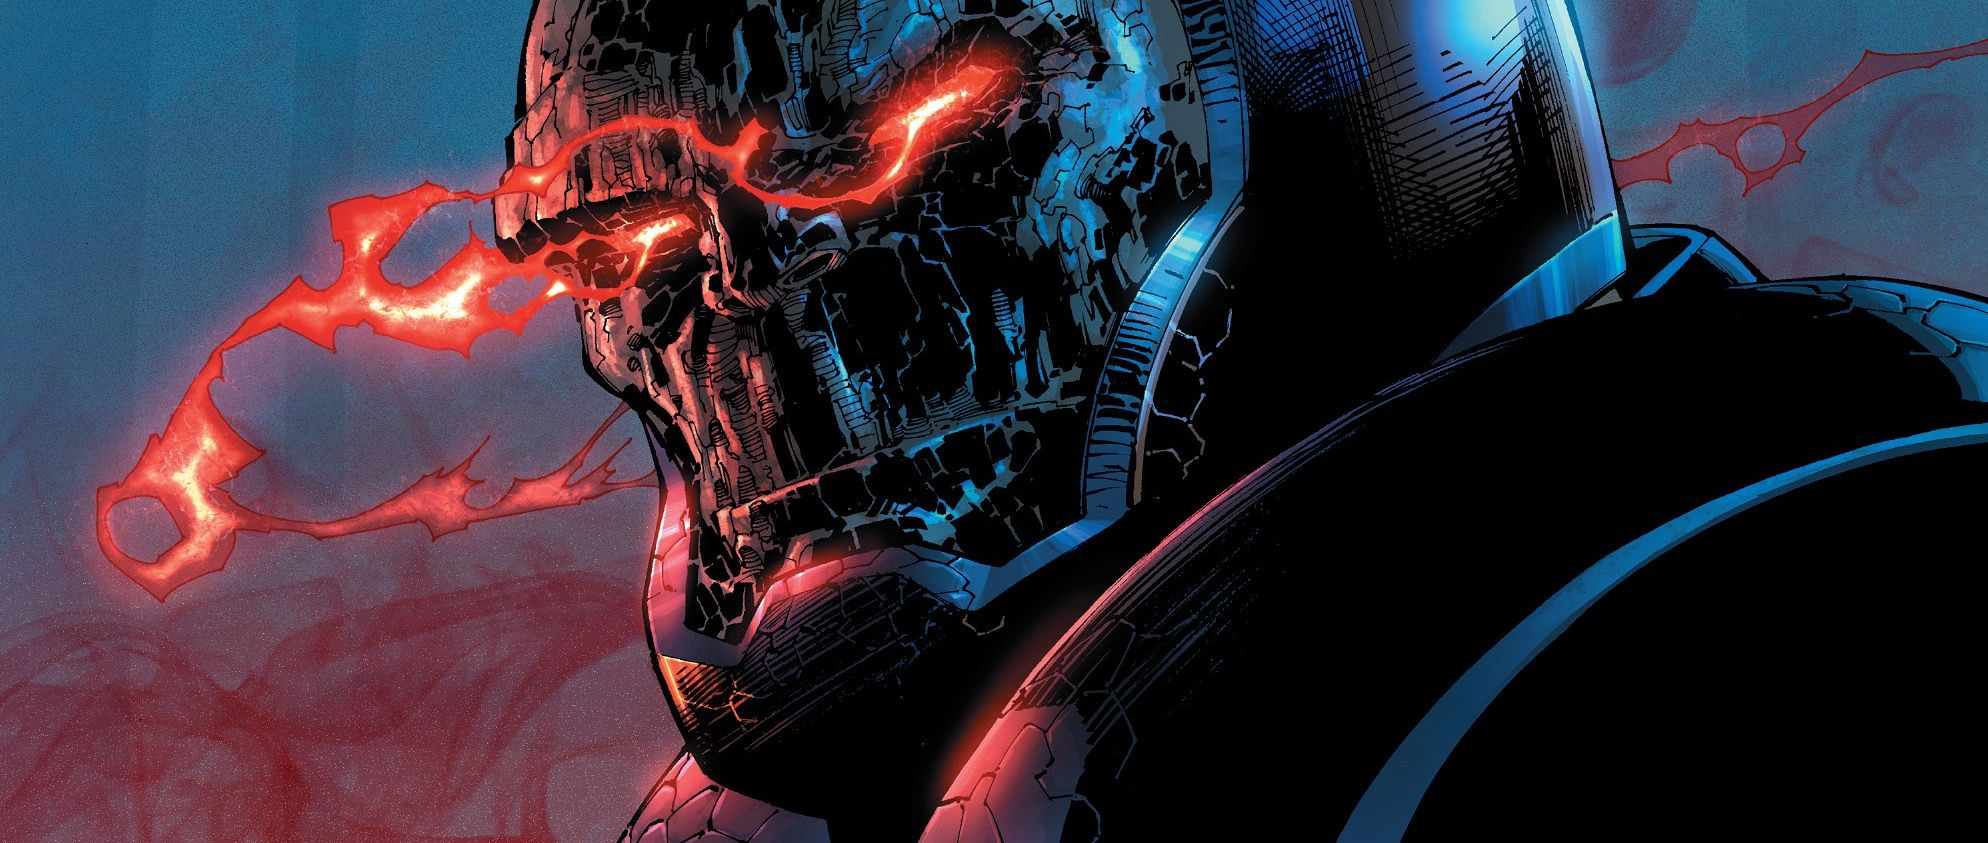 darkseid-vs-thanos-who-would-win-darkseid-jpeg-175452